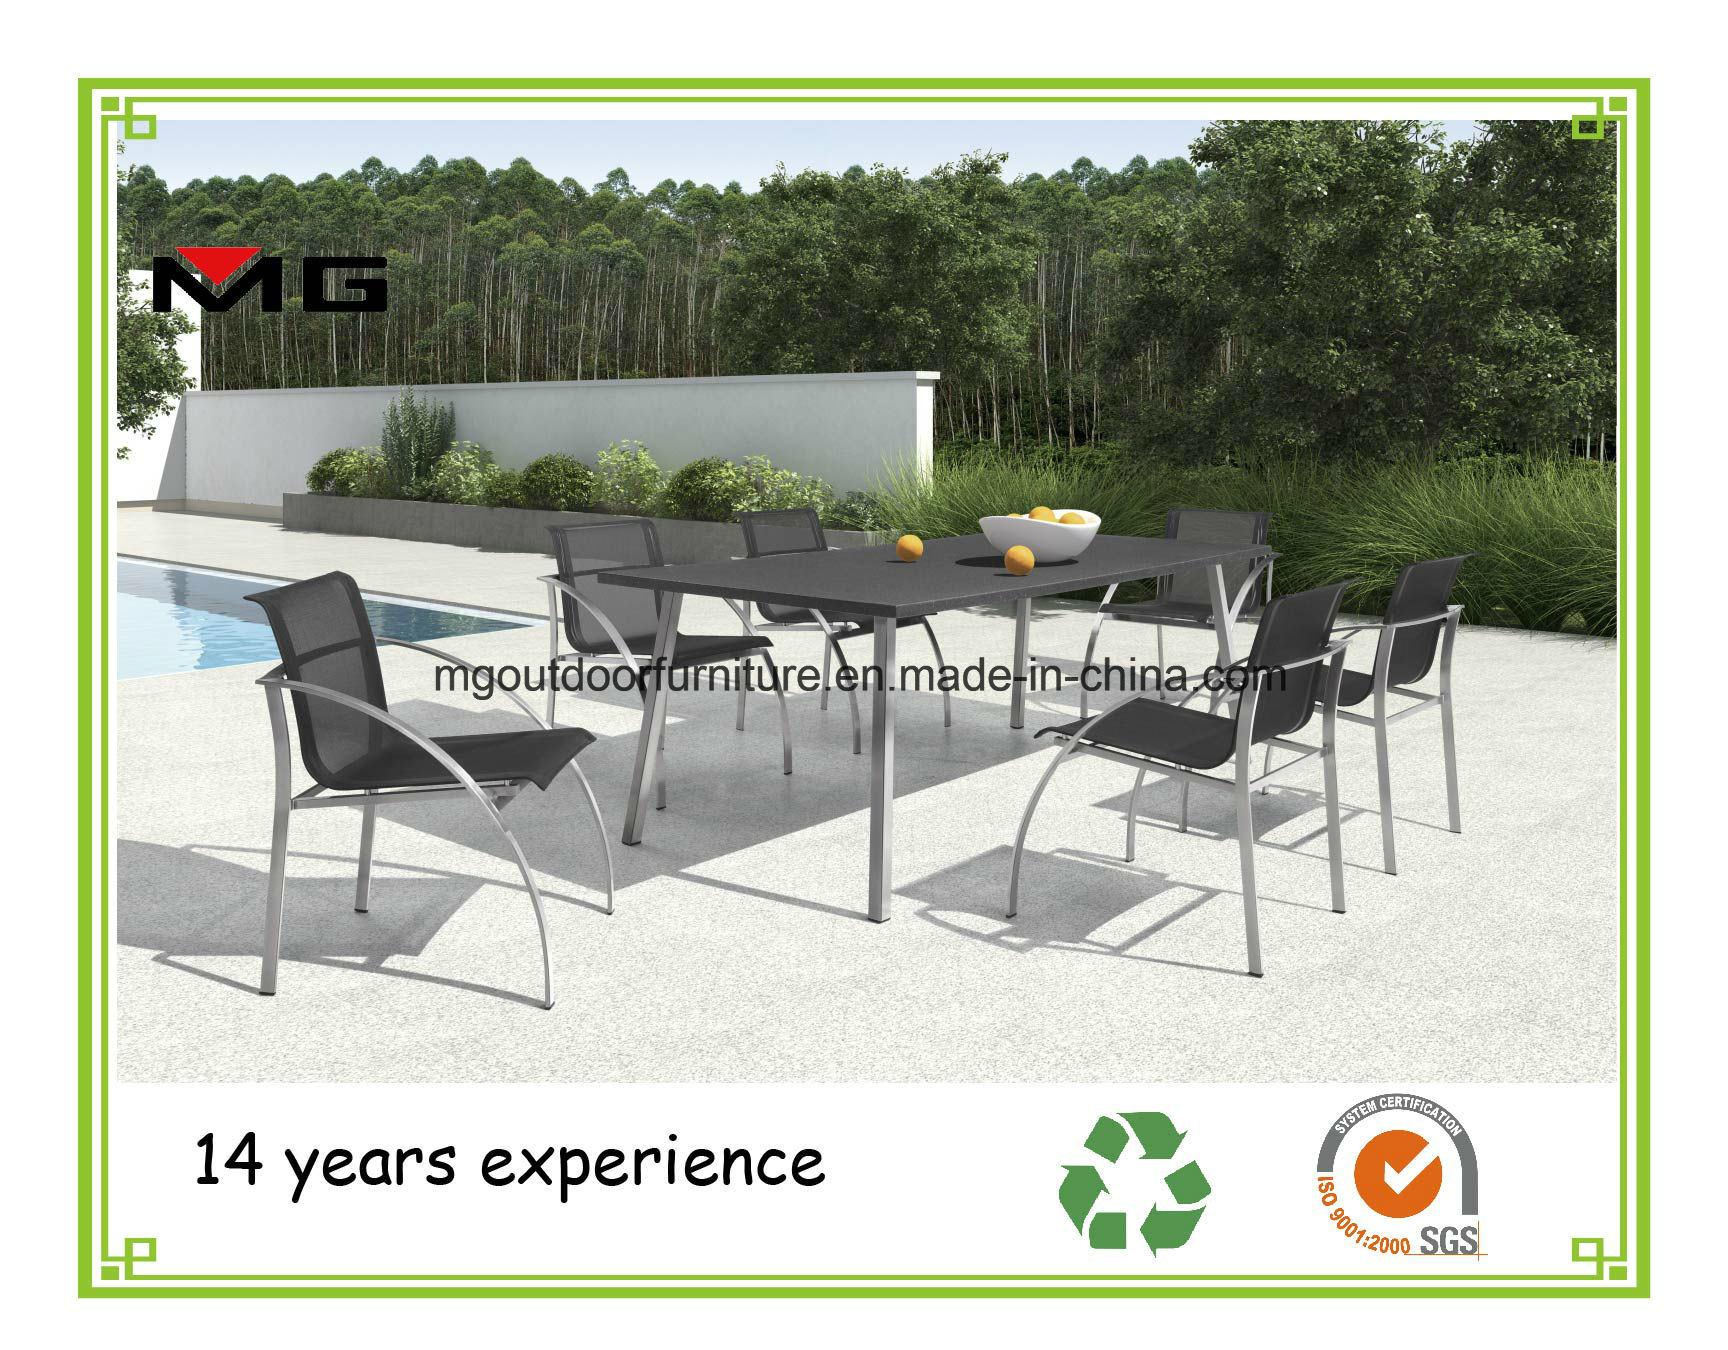 China Outdoor Dining Furniture Garden